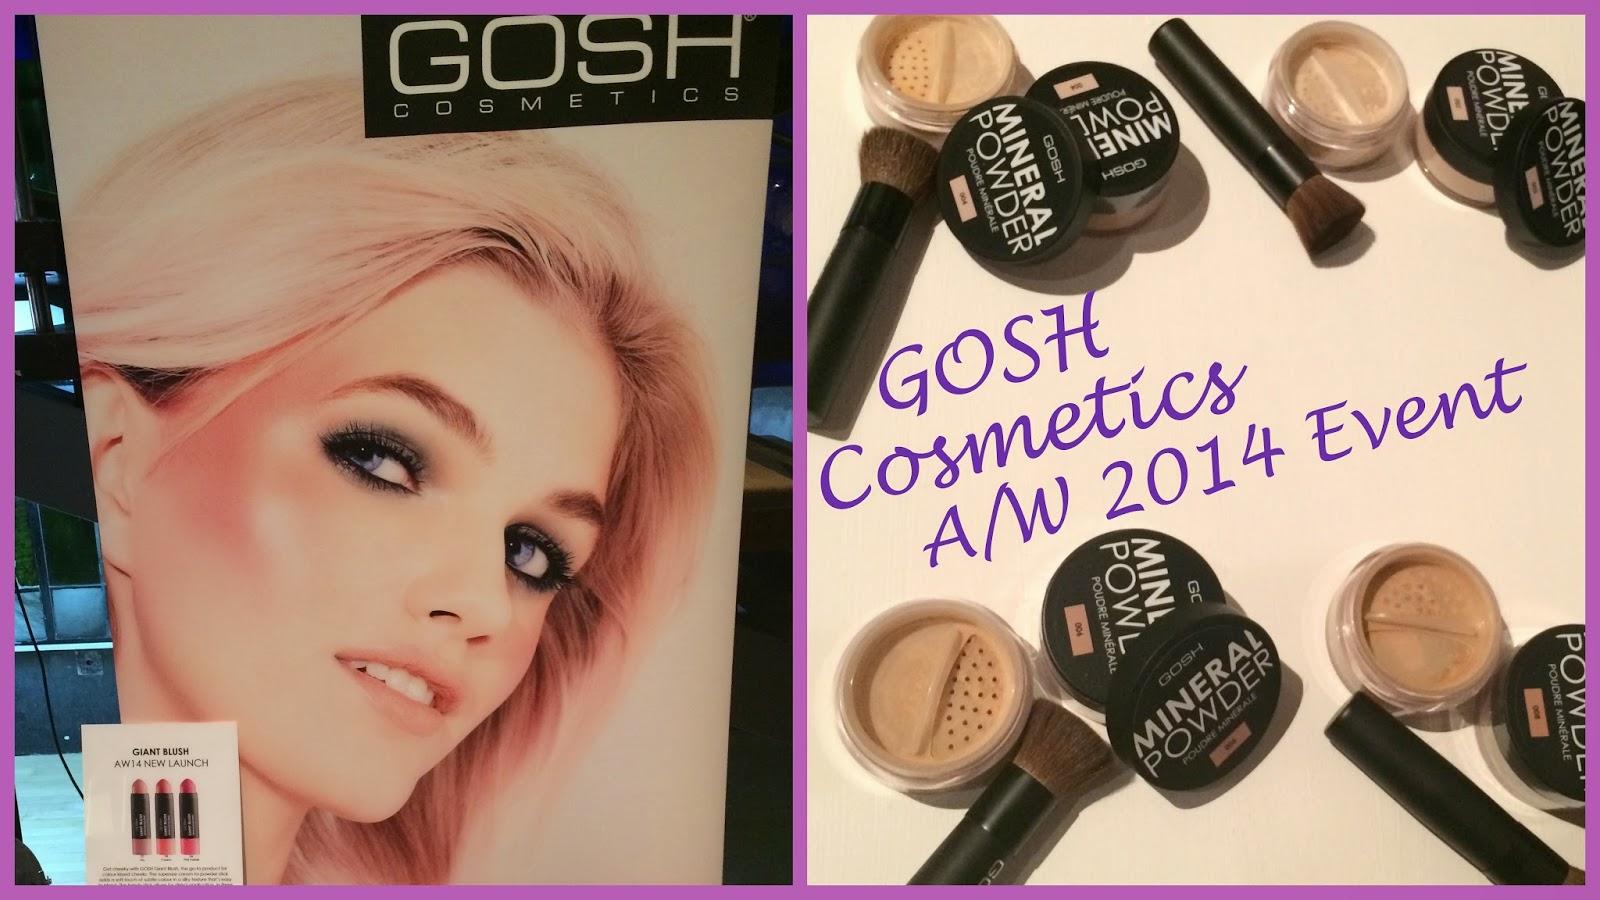 gosh-cosmetics-event-2014-autumn-winter